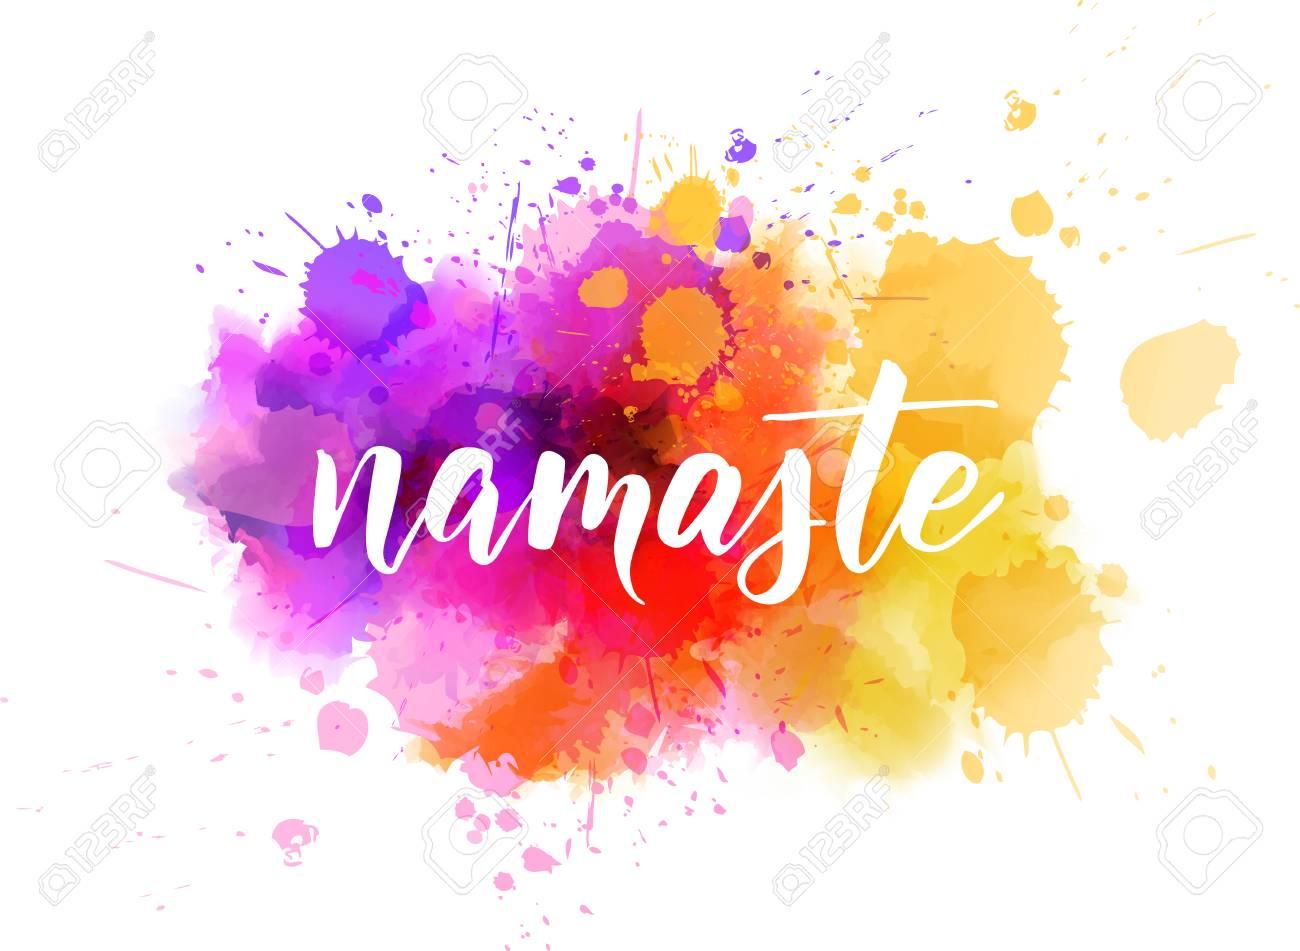 Namaste (Indian greeting, Hello in Hindi) handwritten modern